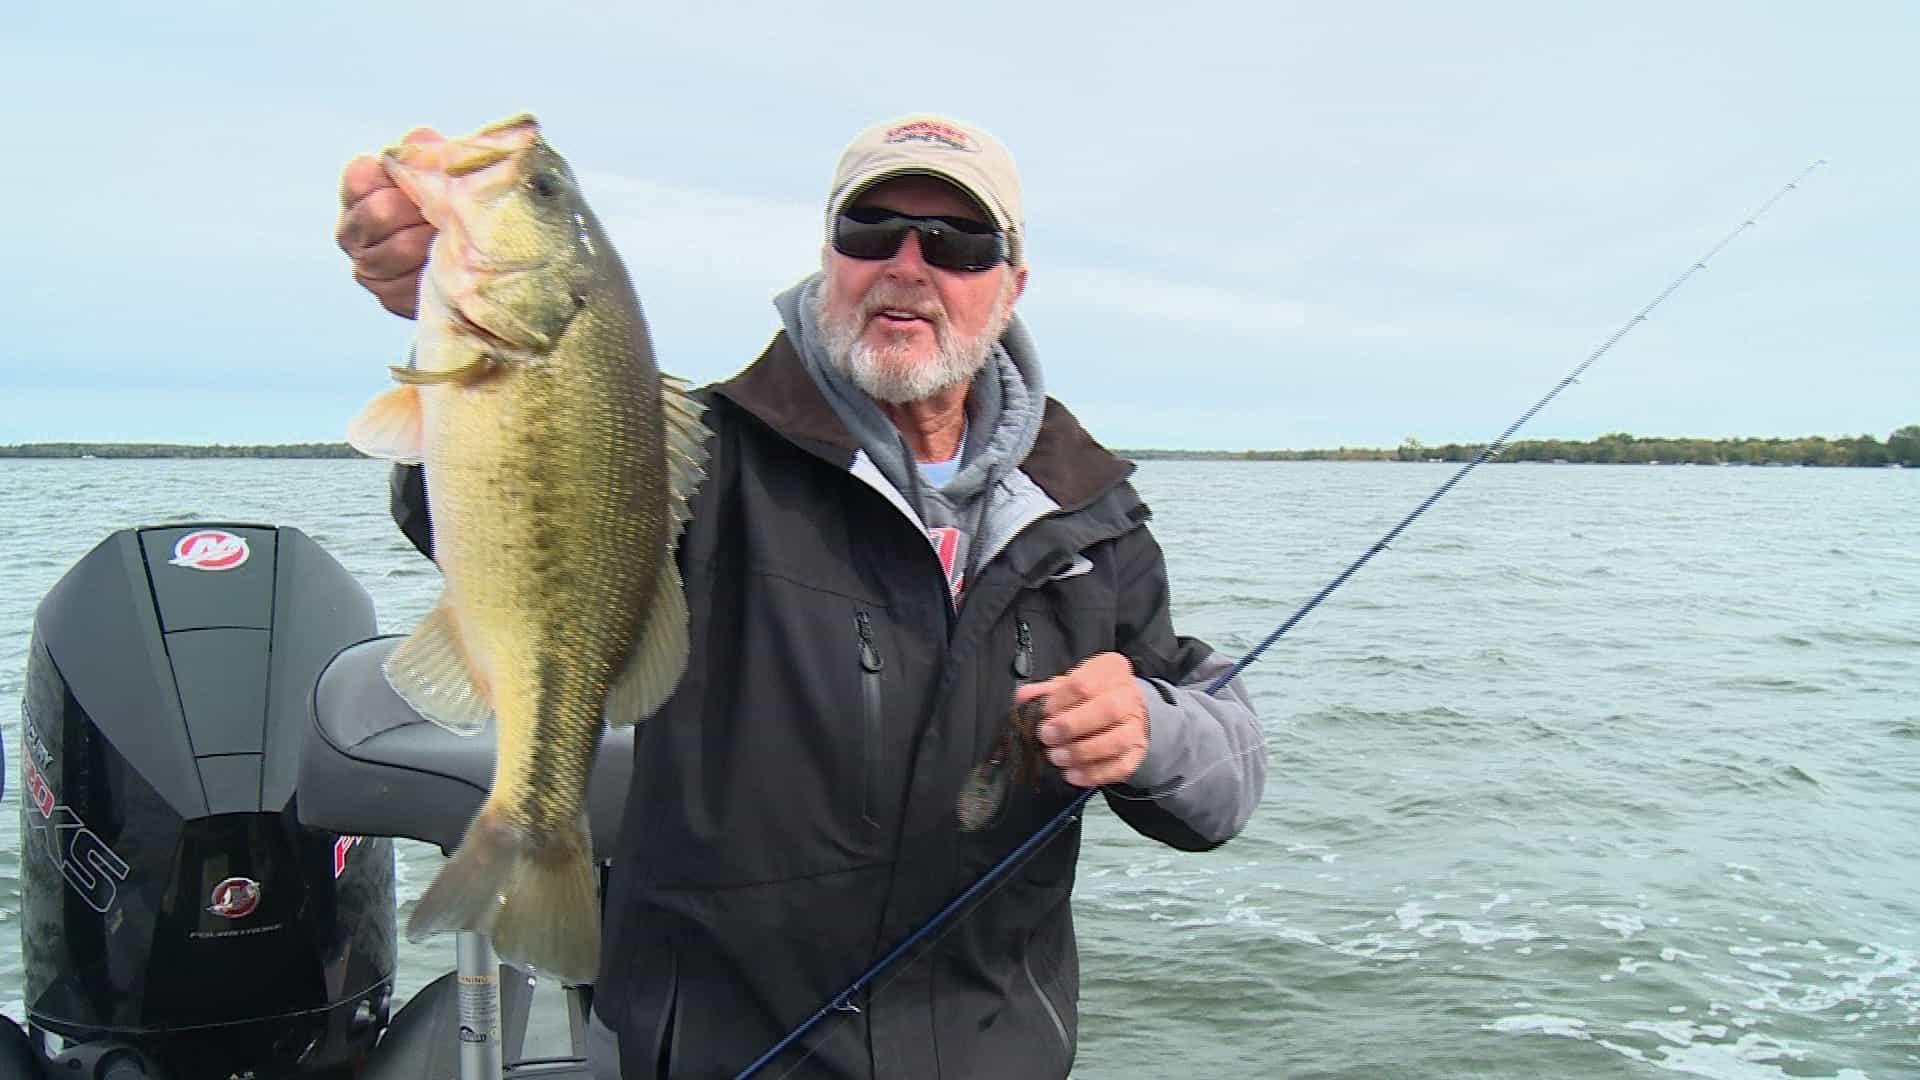 LFE Show 13 Fishing Gear